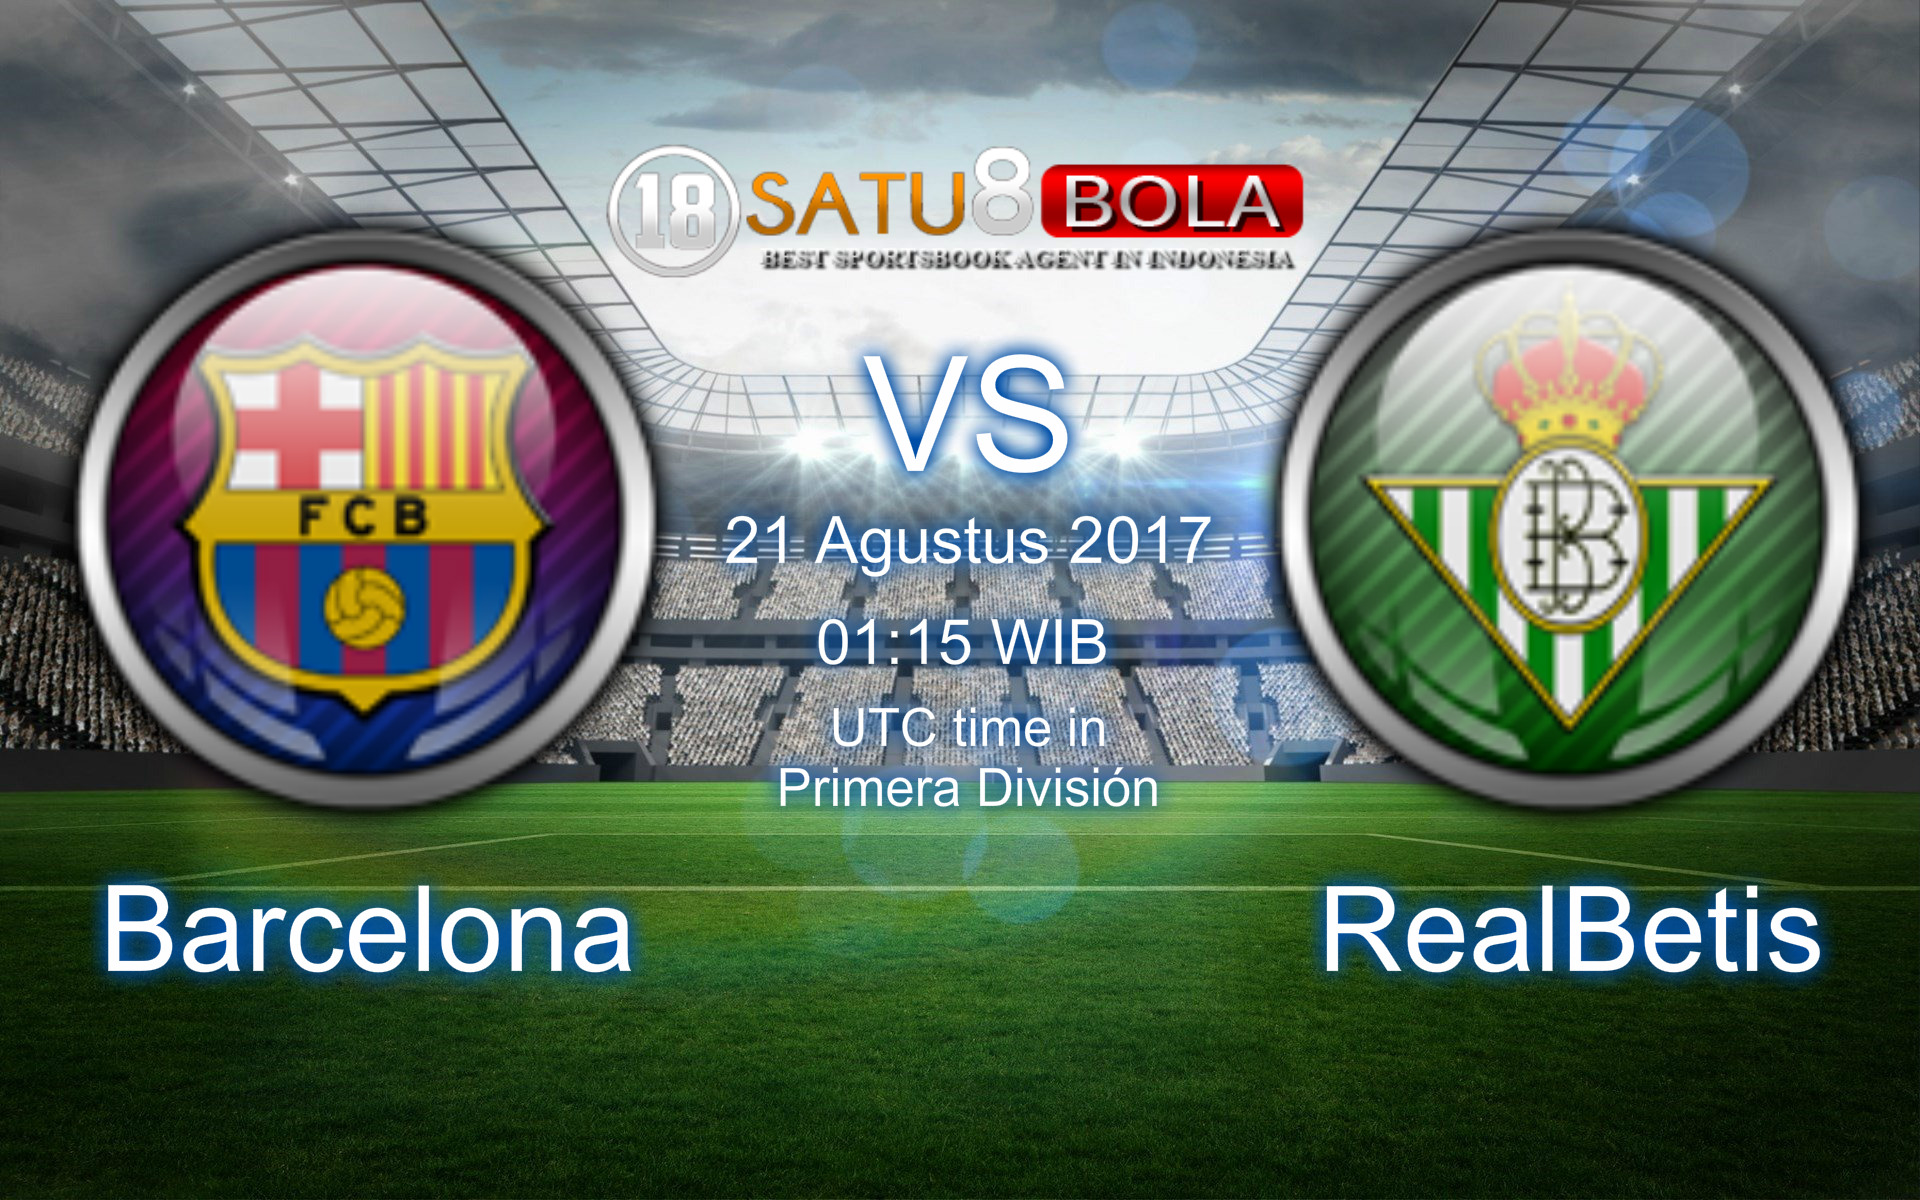 Prediksi Barcelona vs Real Betis 21 Agustus 2017